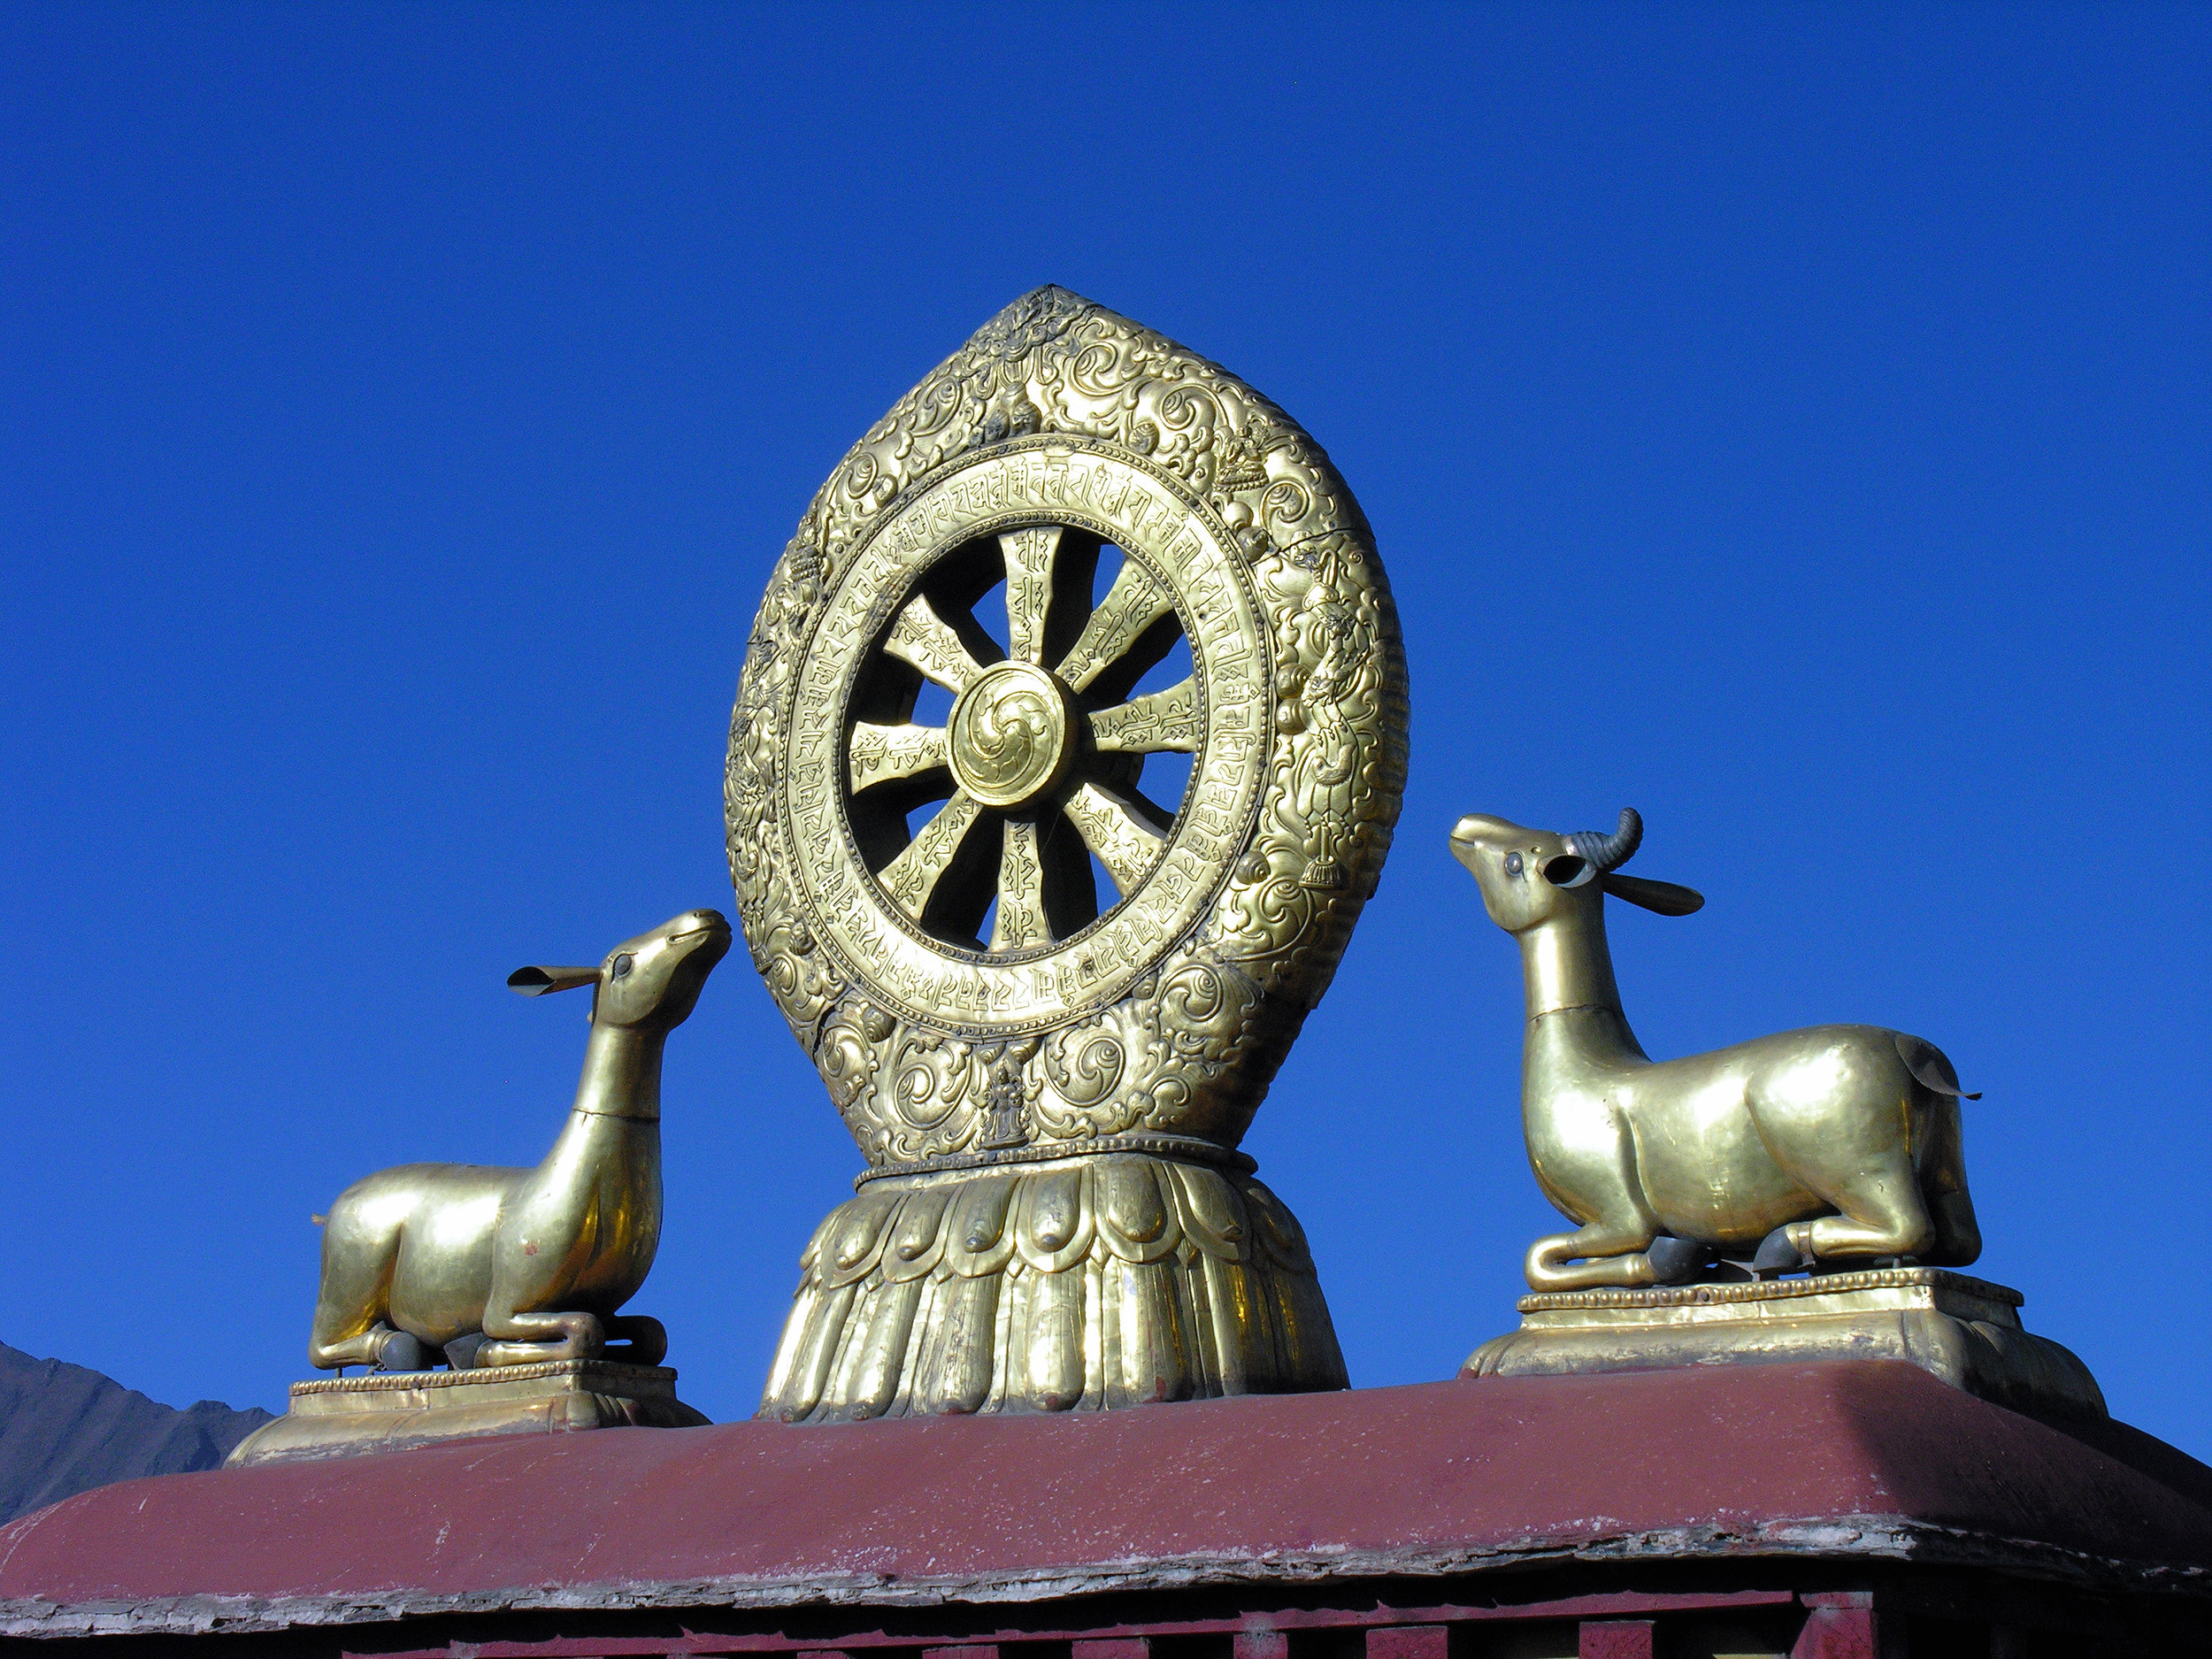 Jokhang_dharma_wheel-5447.jpg